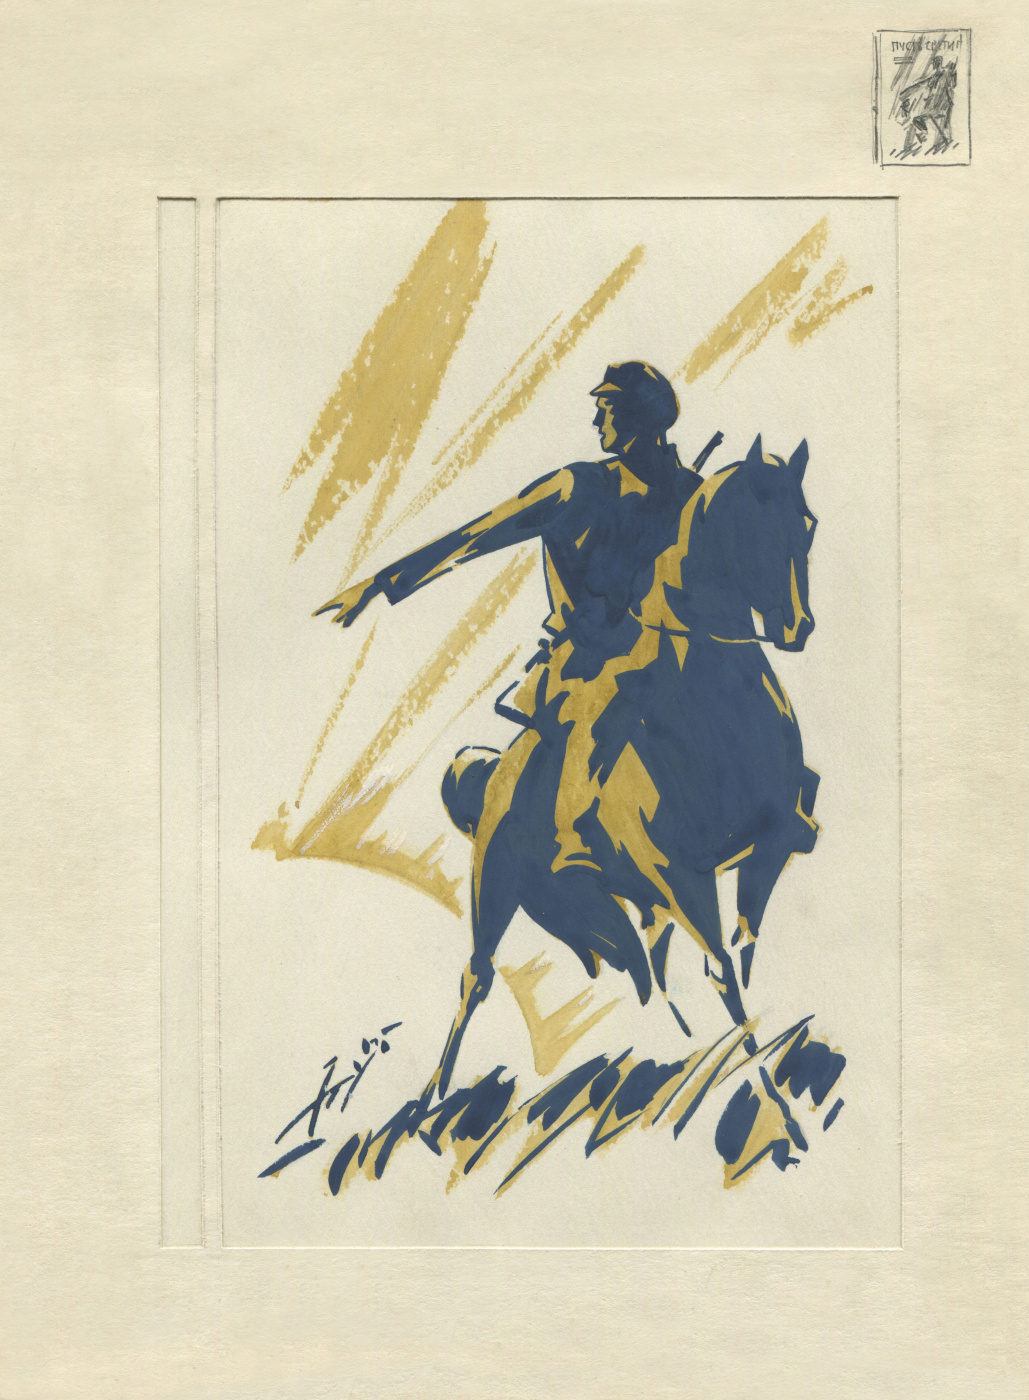 Alexandrovich Rudolf Pavlov. Let it shine, A. Gaidar. Cover option 5. South Ural Book Publishing House.